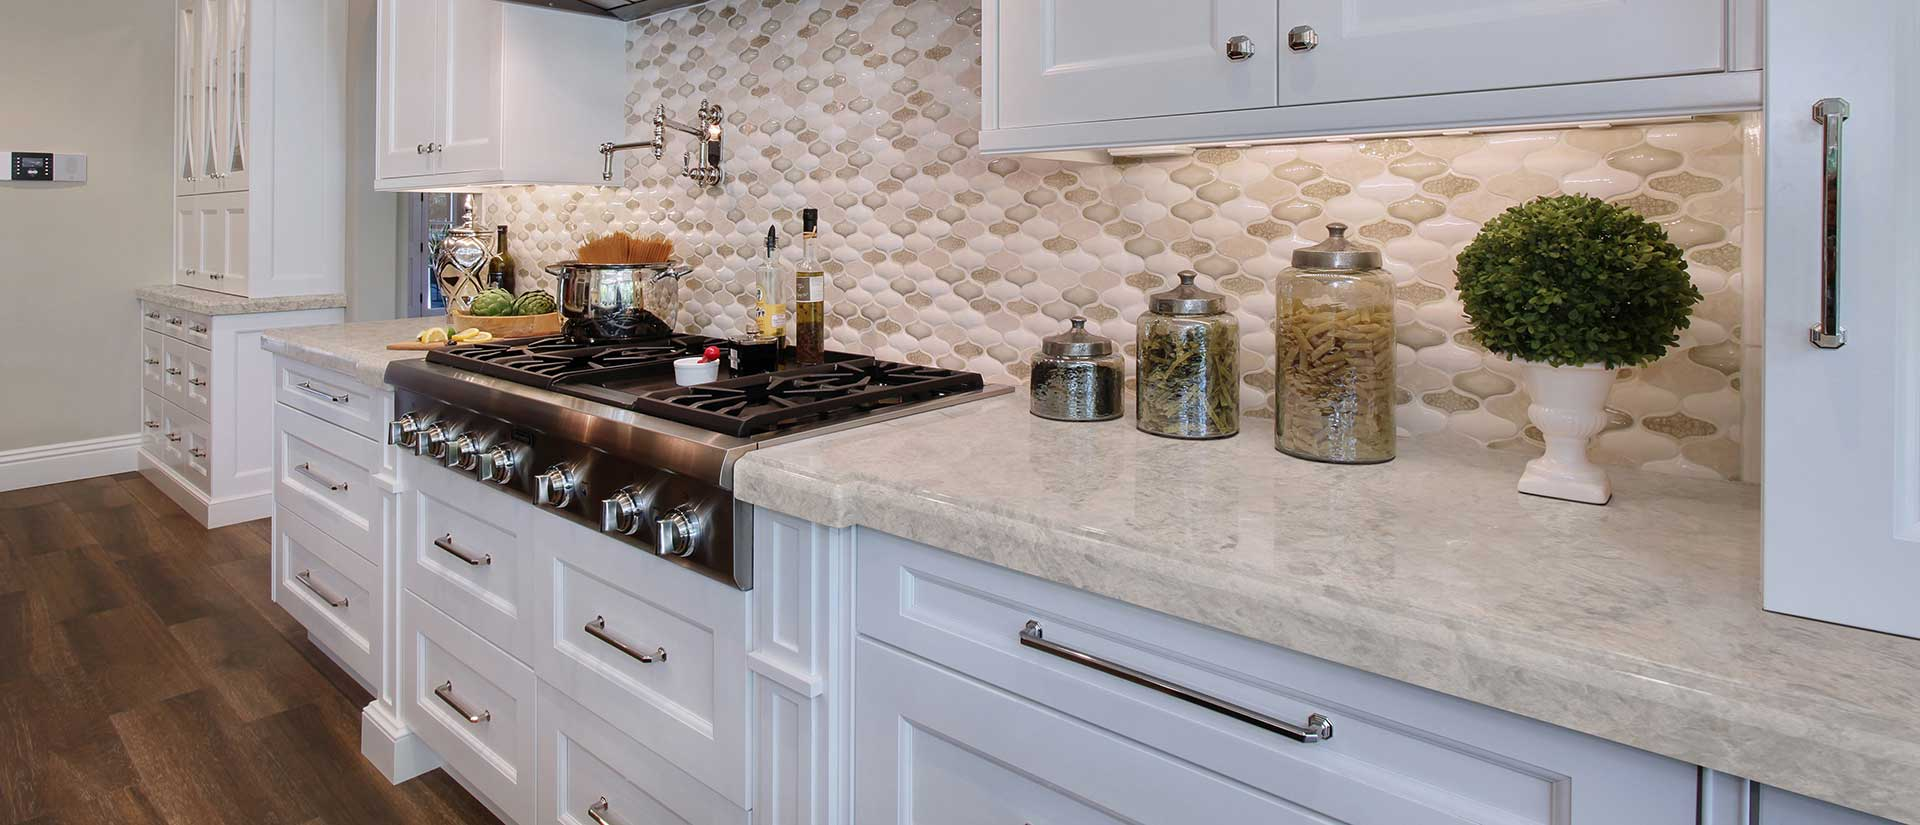 Portico Cream Quartz Countertops